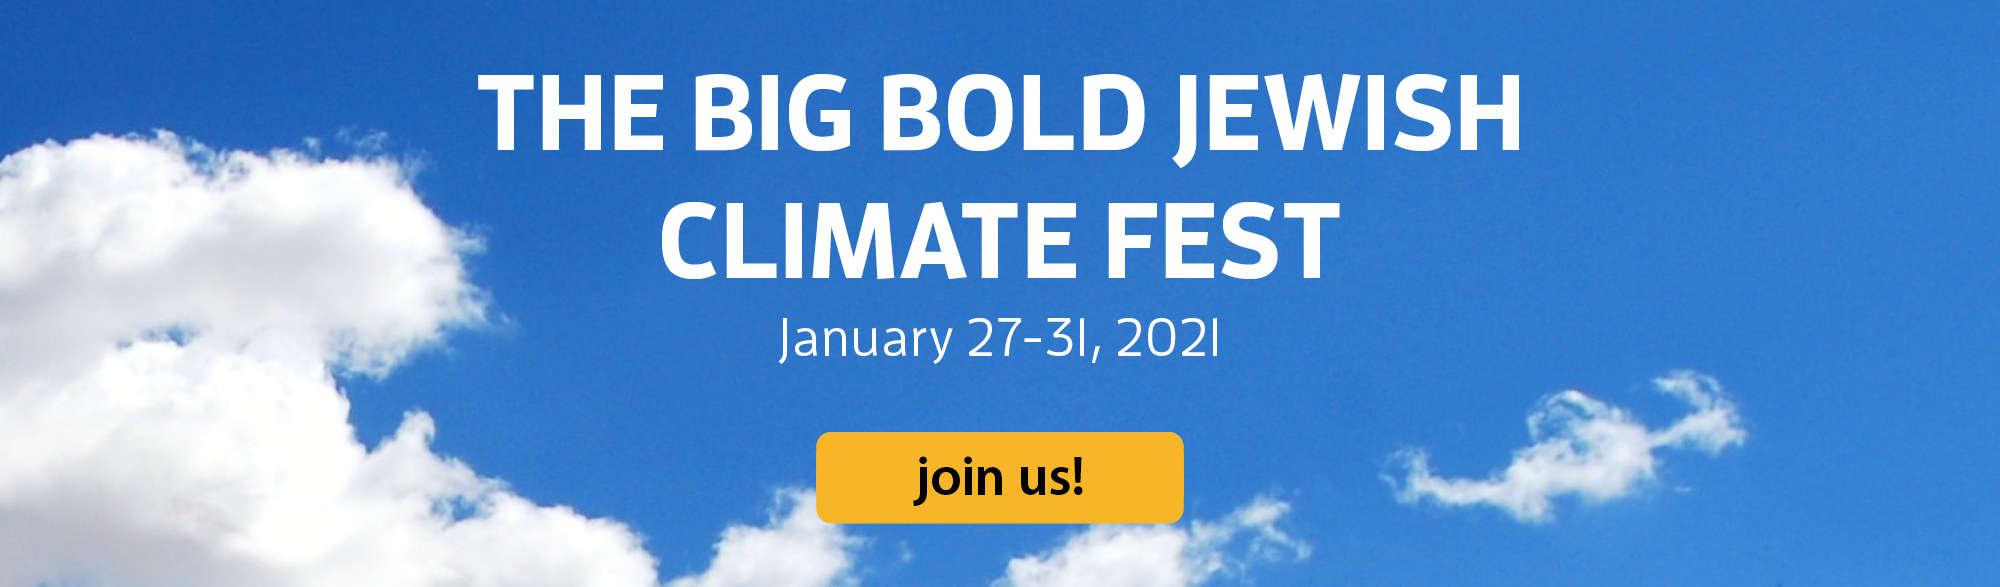 big bold jewish climate fest